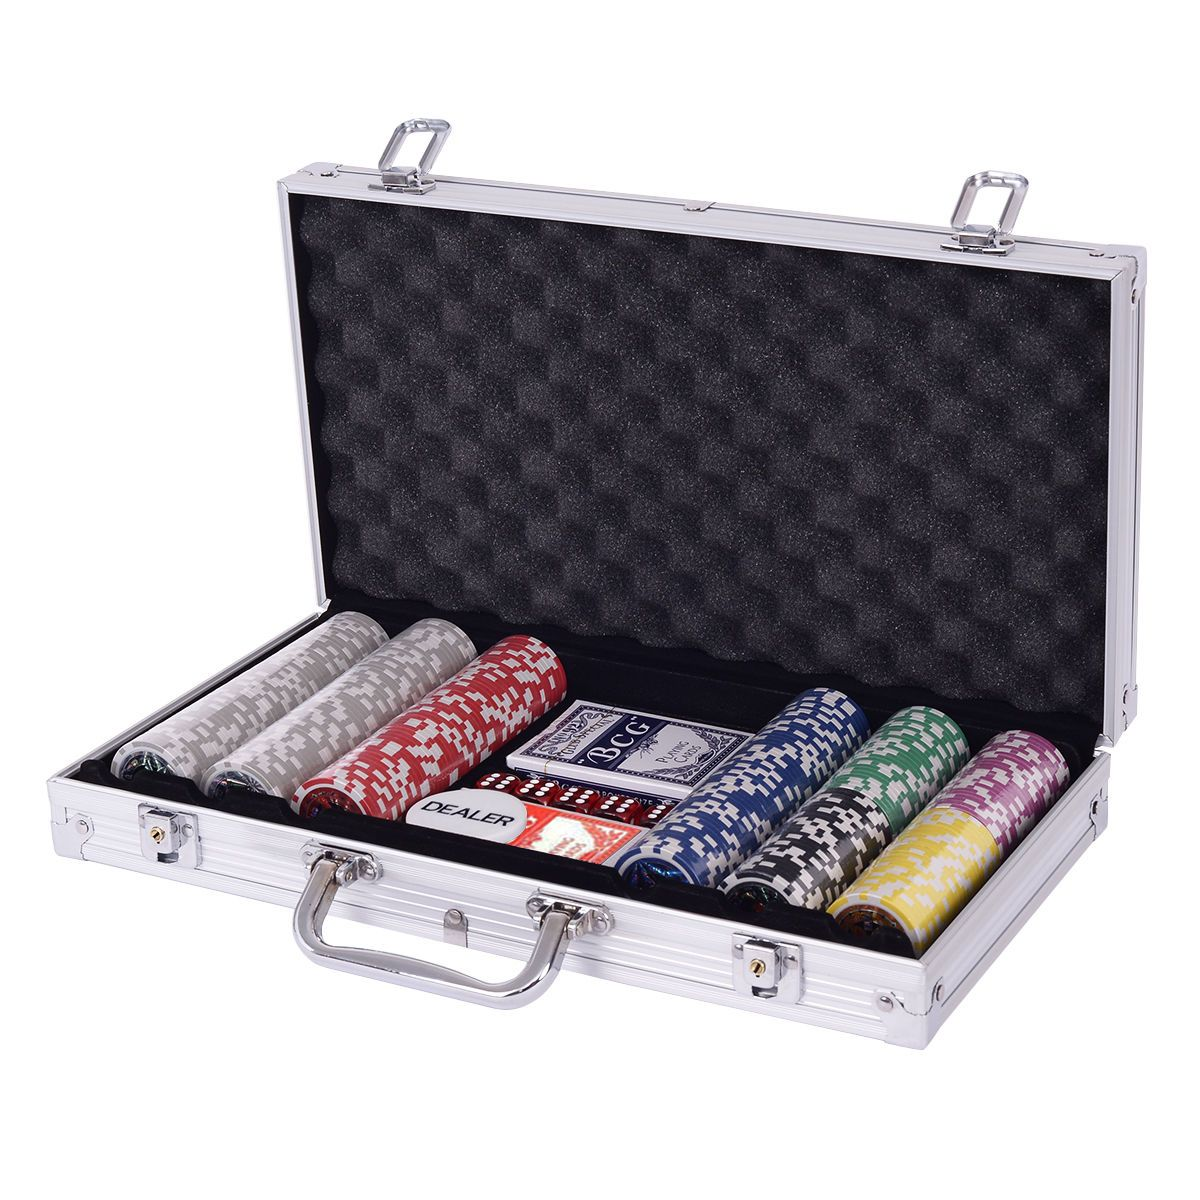 Poker Chip Set 300 Chips Texas Holdem Cards Poker chips